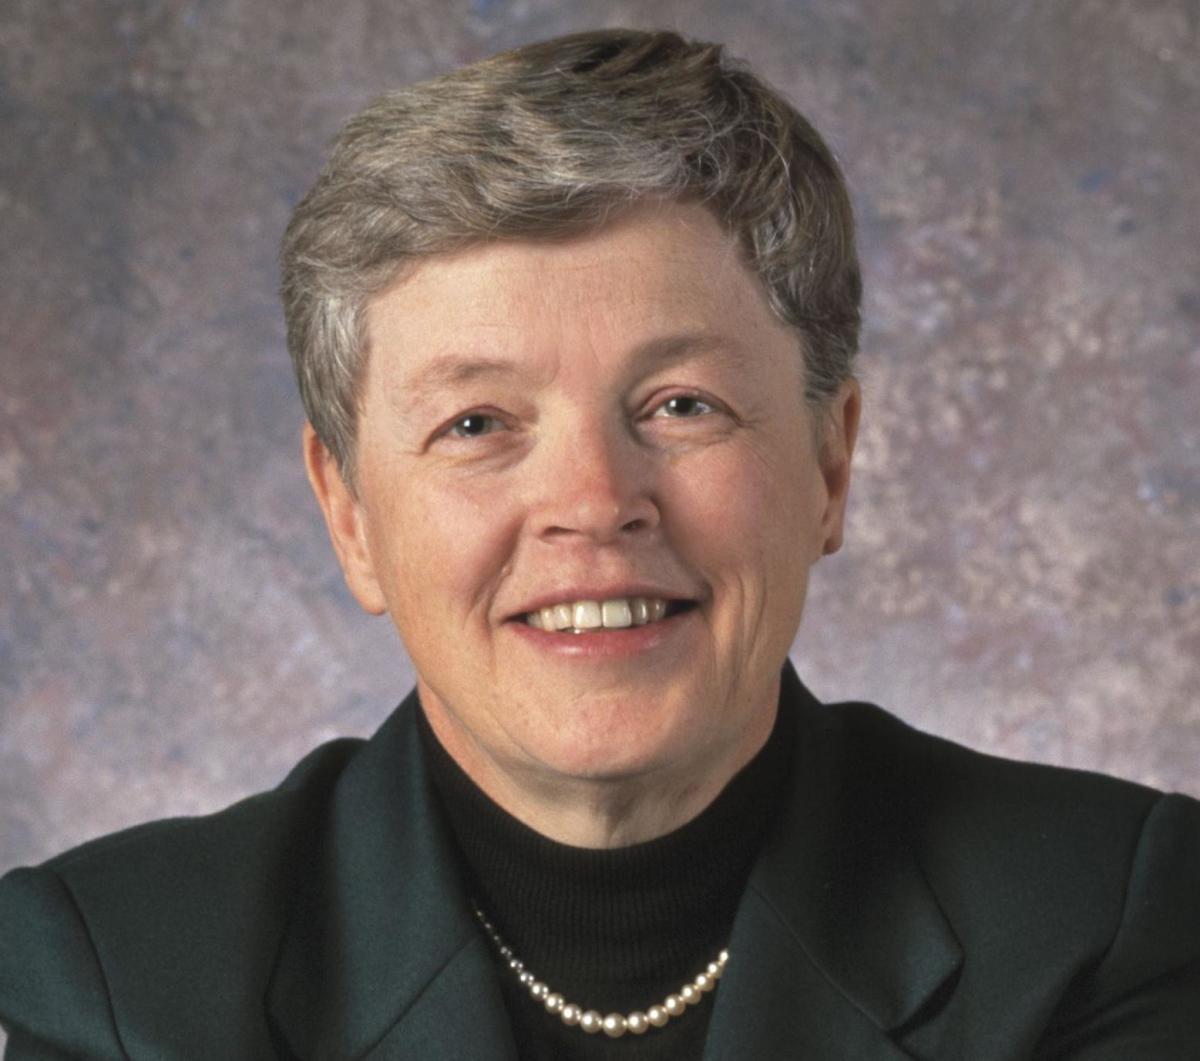 Dr. Lou Anna K. Simon Photo courtesy of Michigan State University